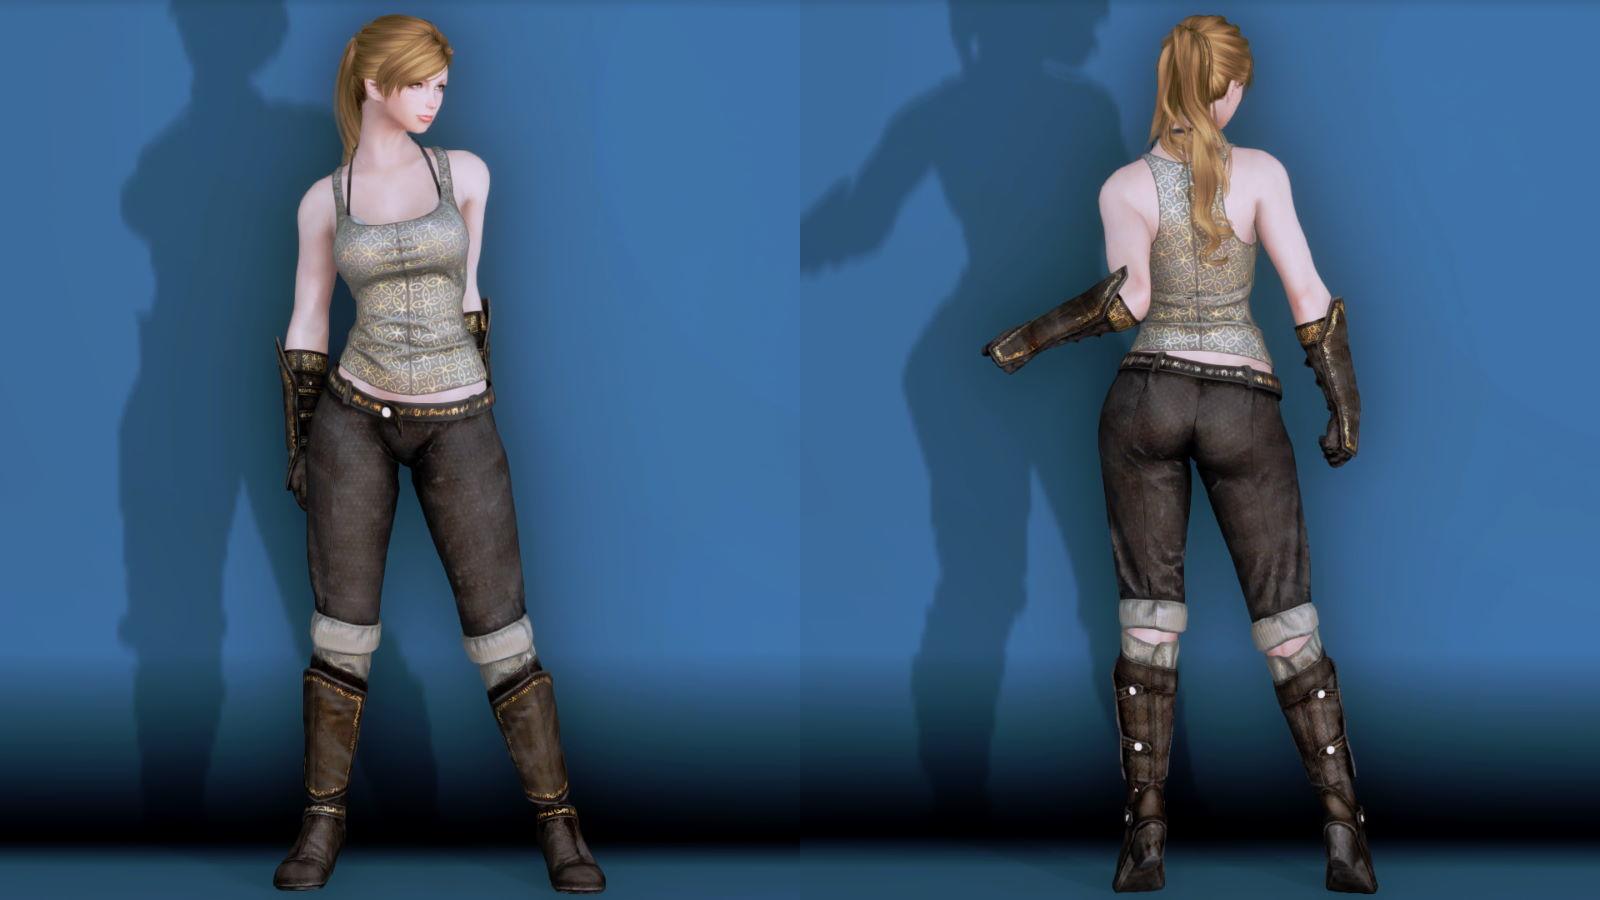 RuggedRogueSSE 231-1 Pose Fu-Ba-F Vest Trouser 2